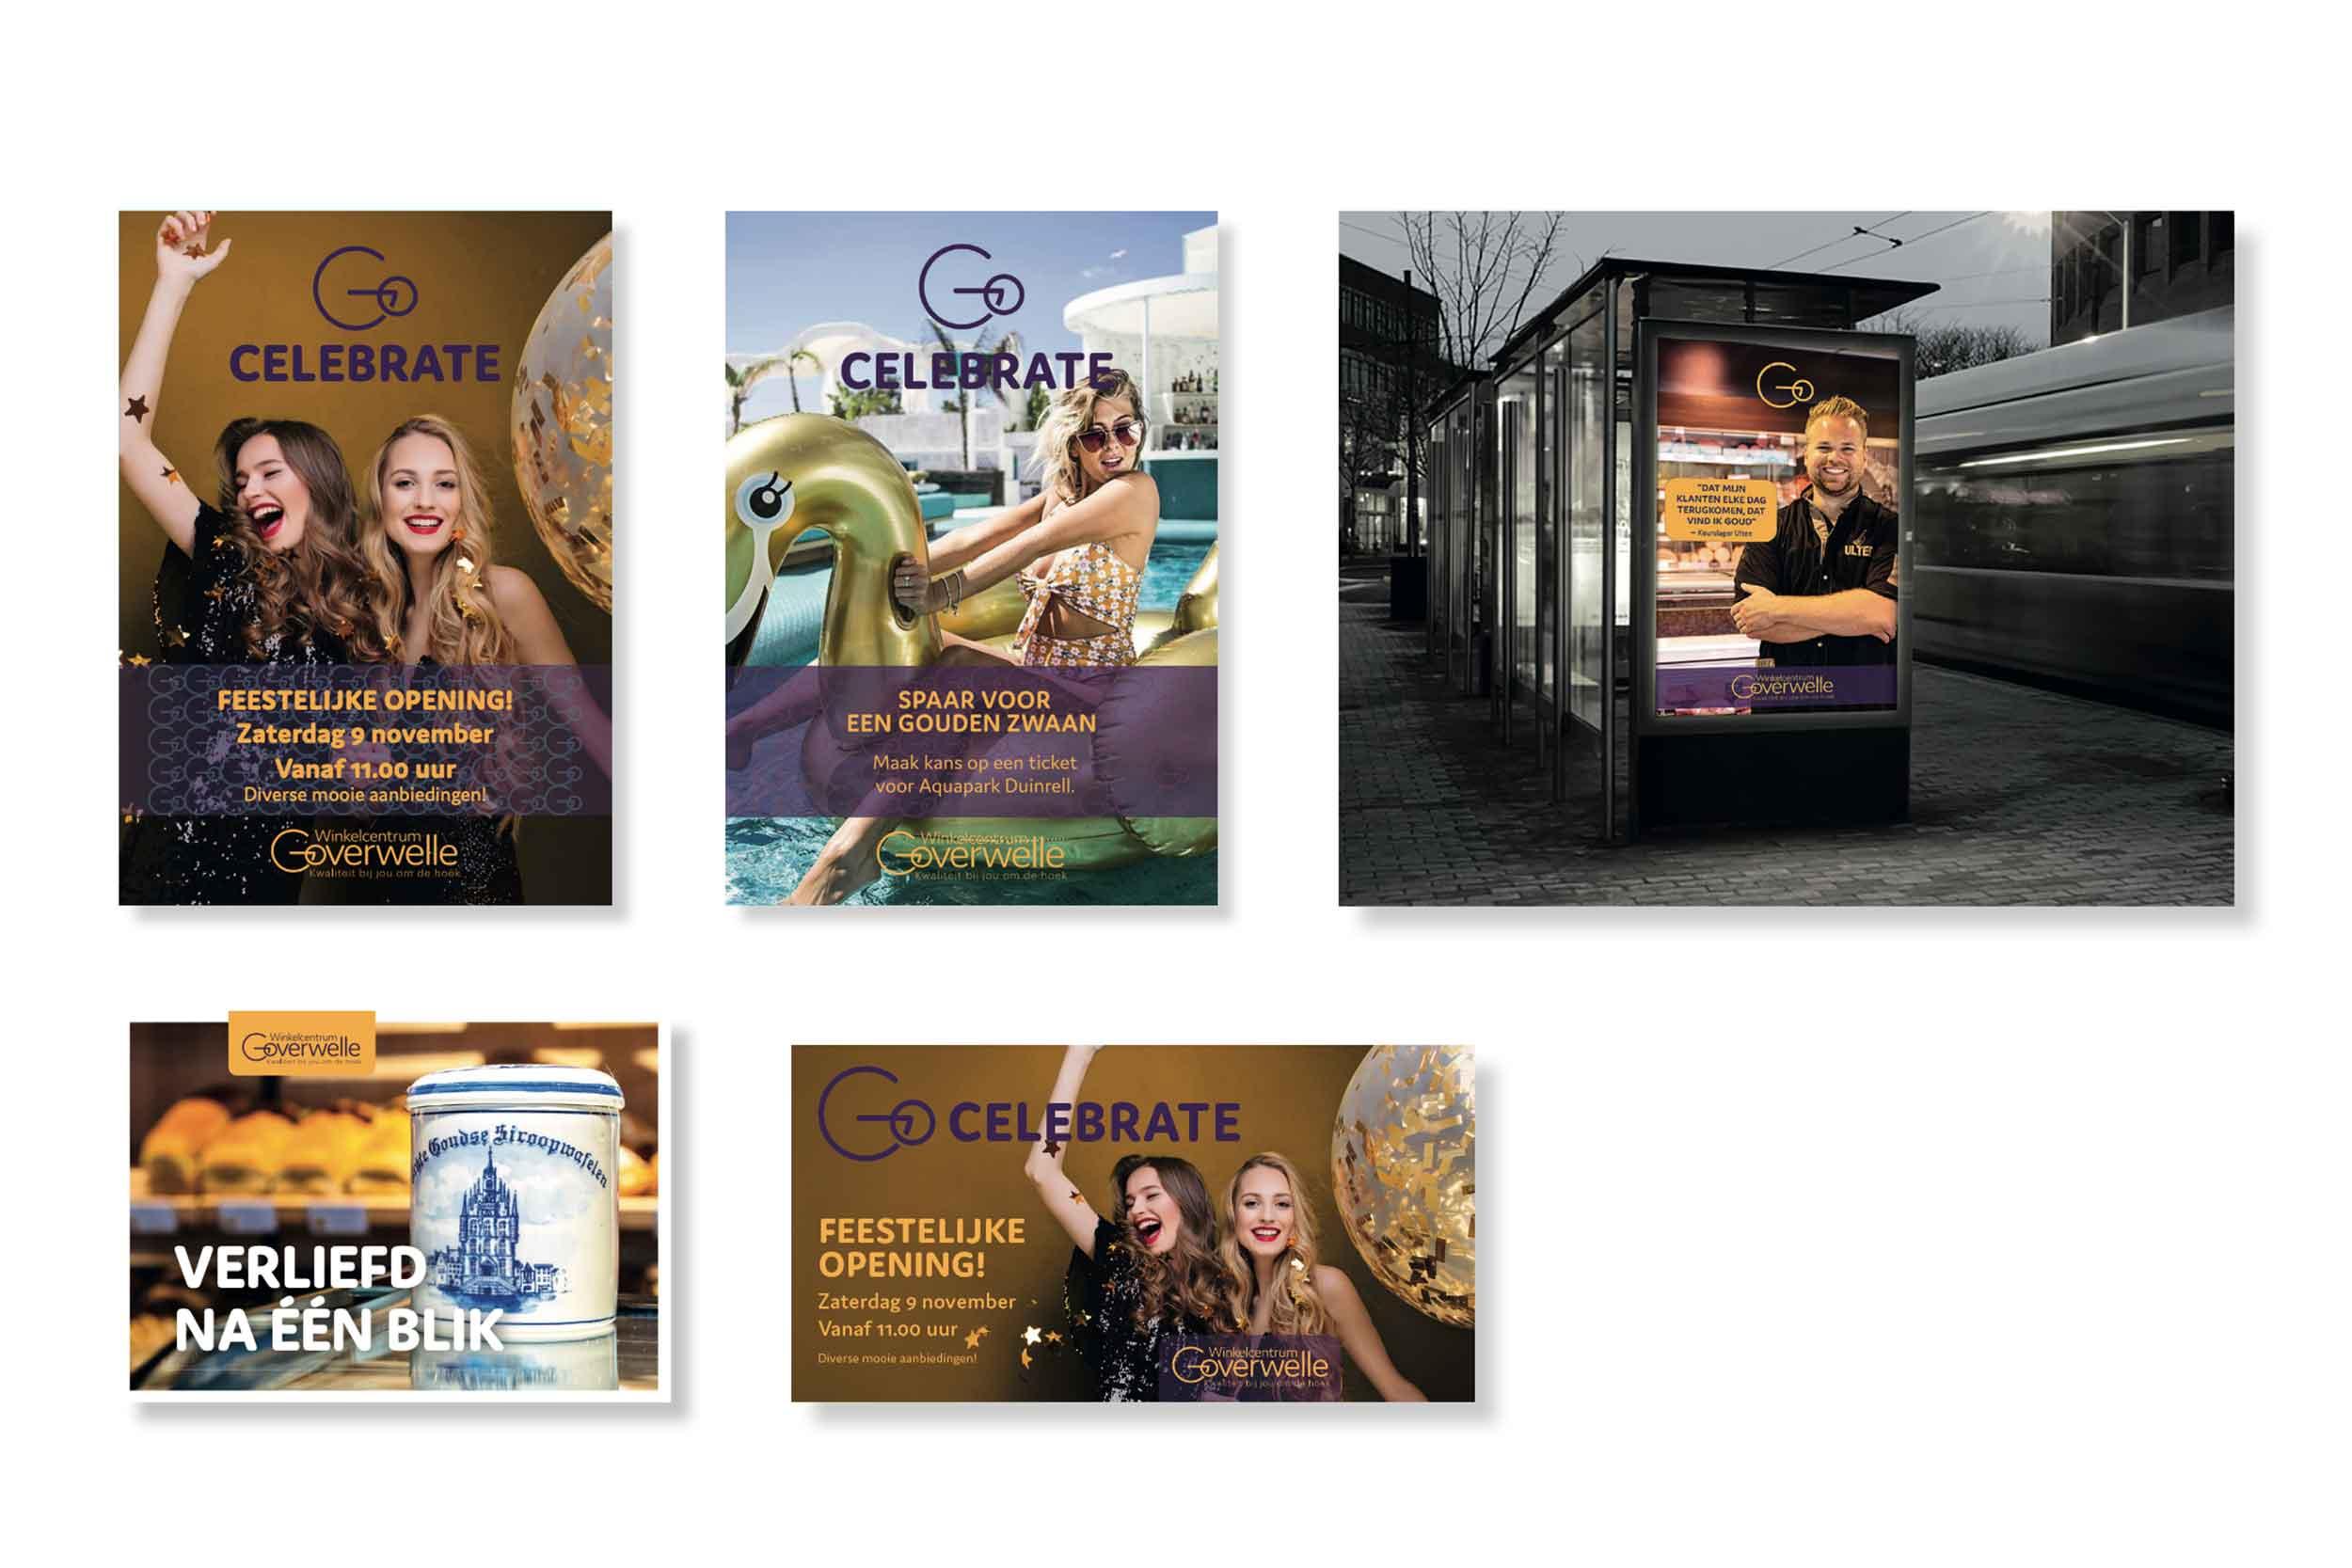 Winkelcentrum Goverwelle - Gouda reclame posters © Urban Solutions (strategie - concept)